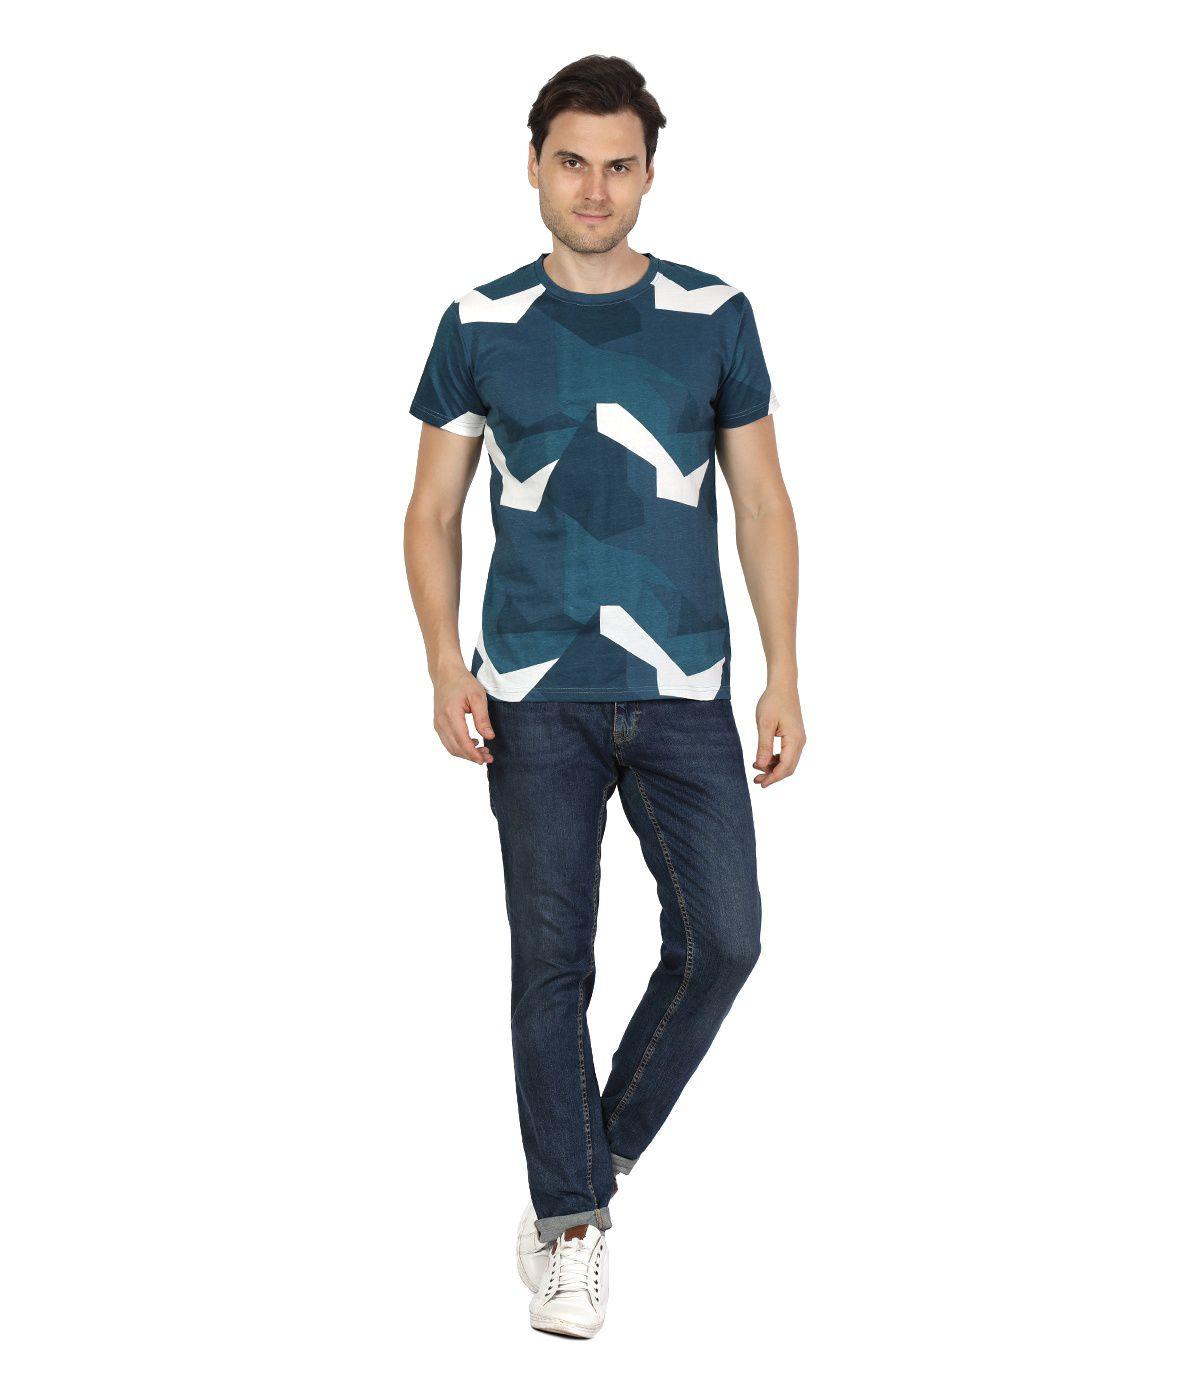 BlackBuk Turquoise Round T-Shirt Pack of 1